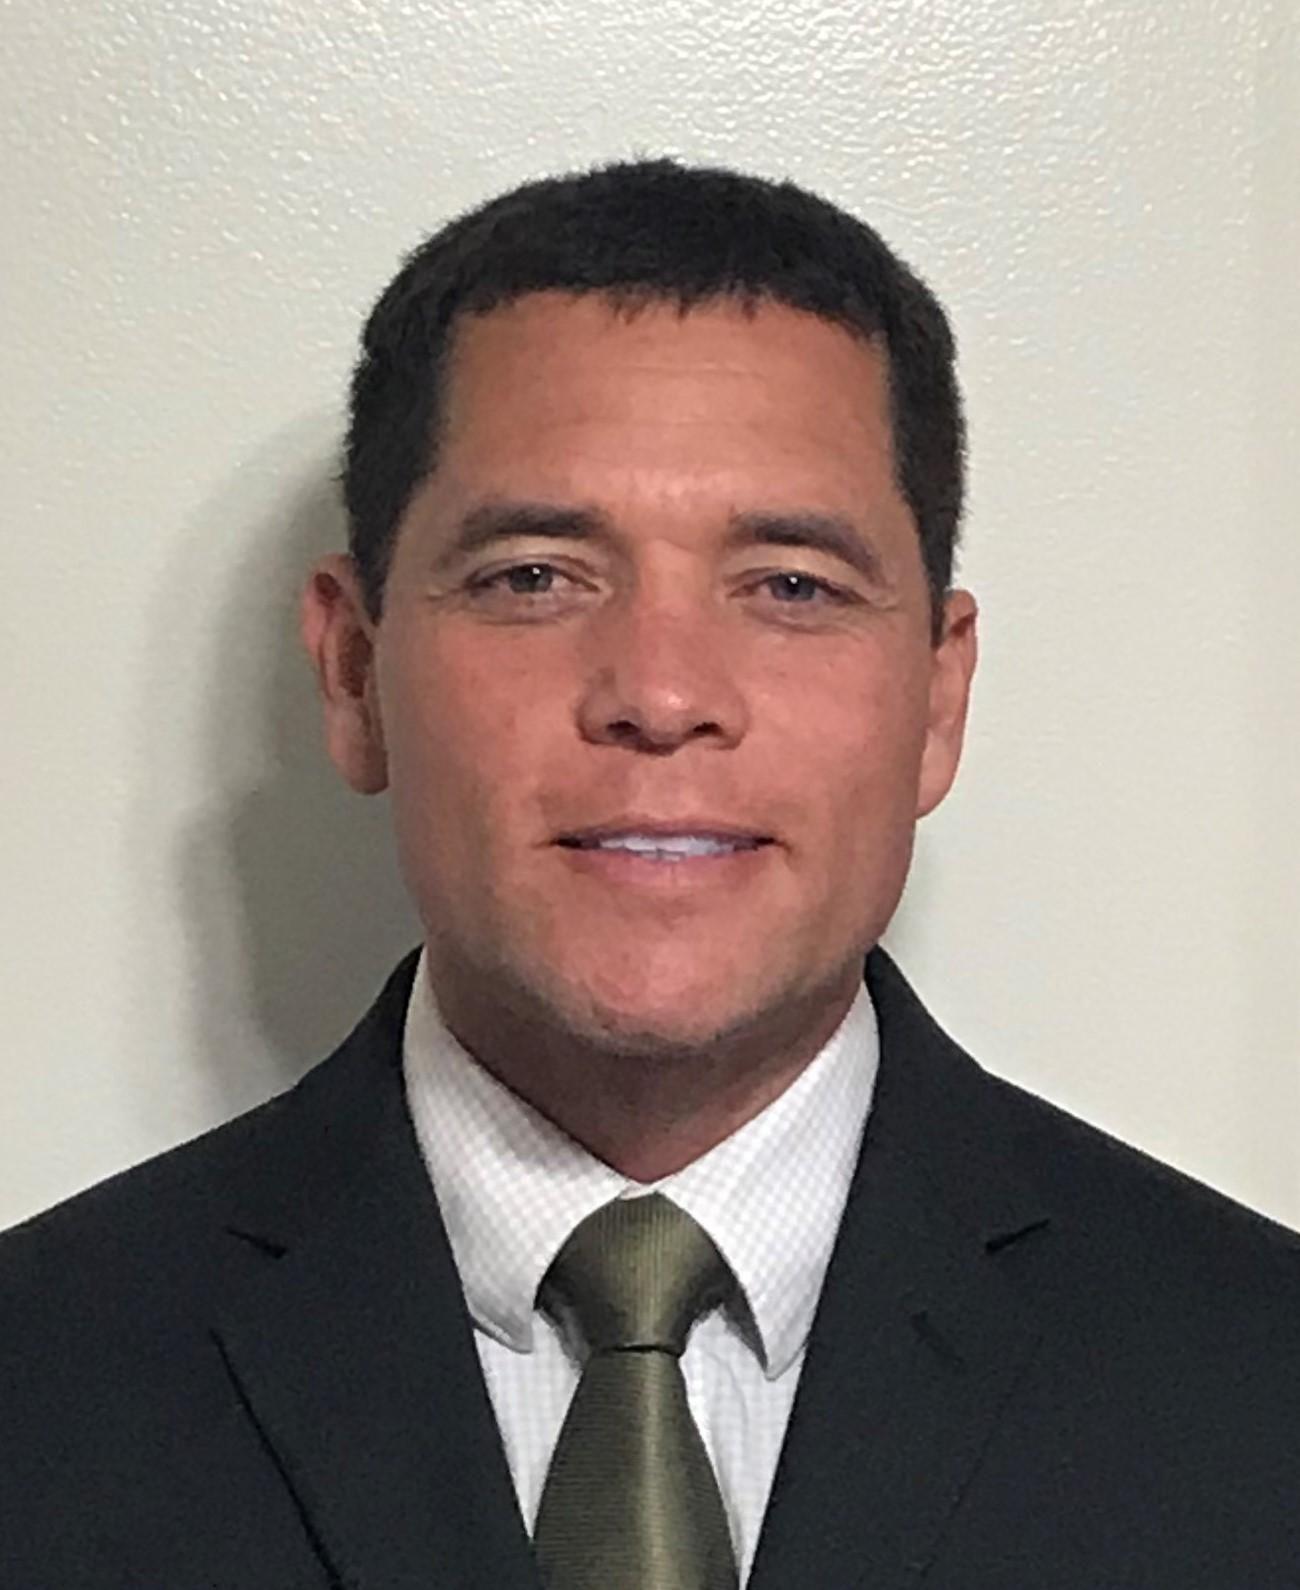 Joey Mercer